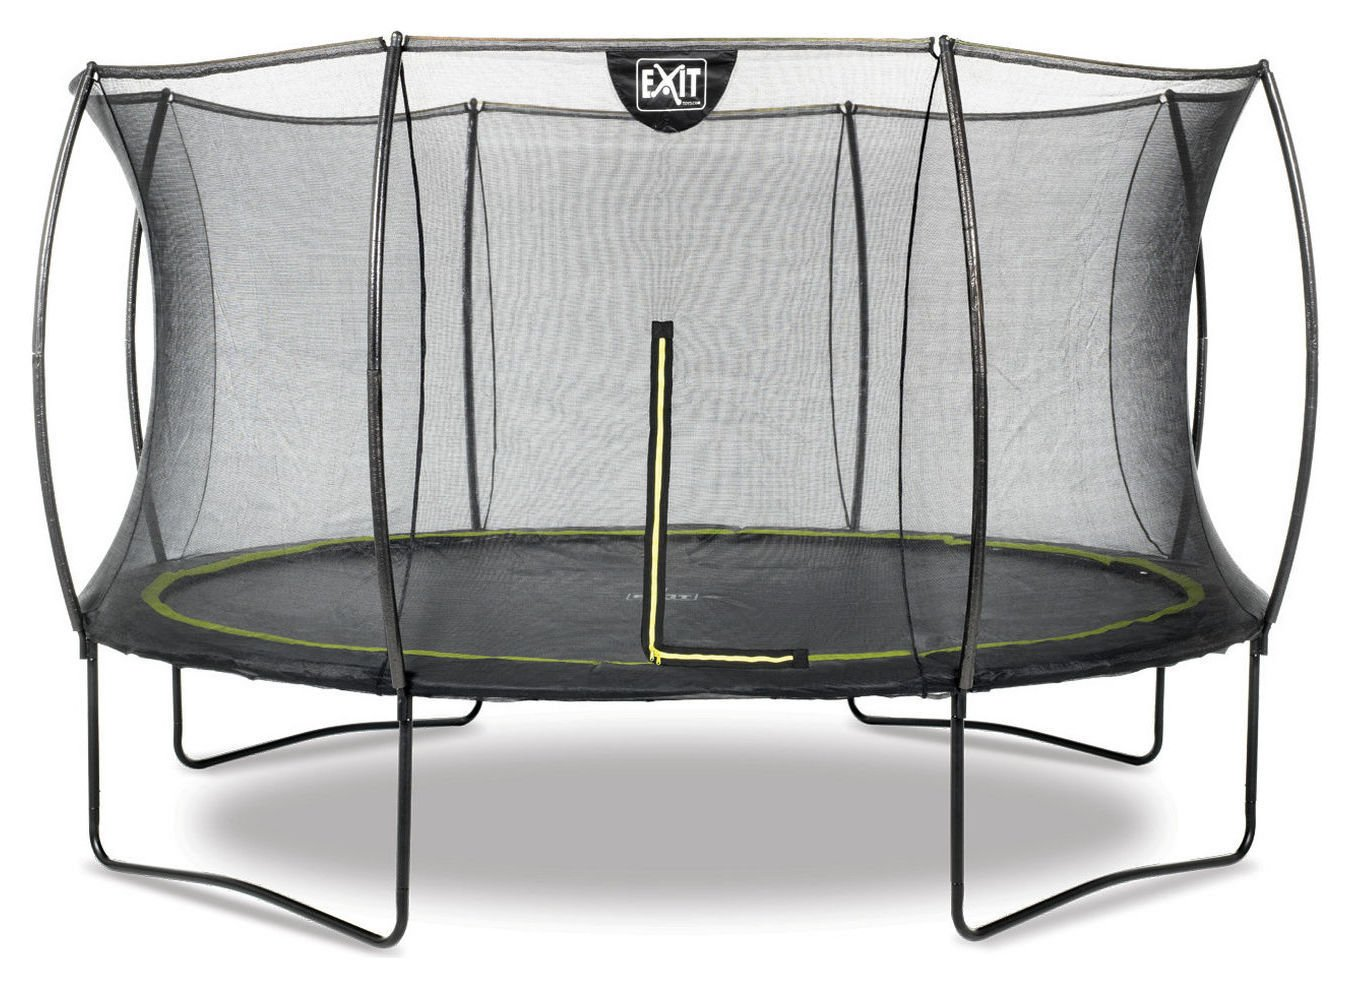 EXIT 14ft Black Edition Trampoline